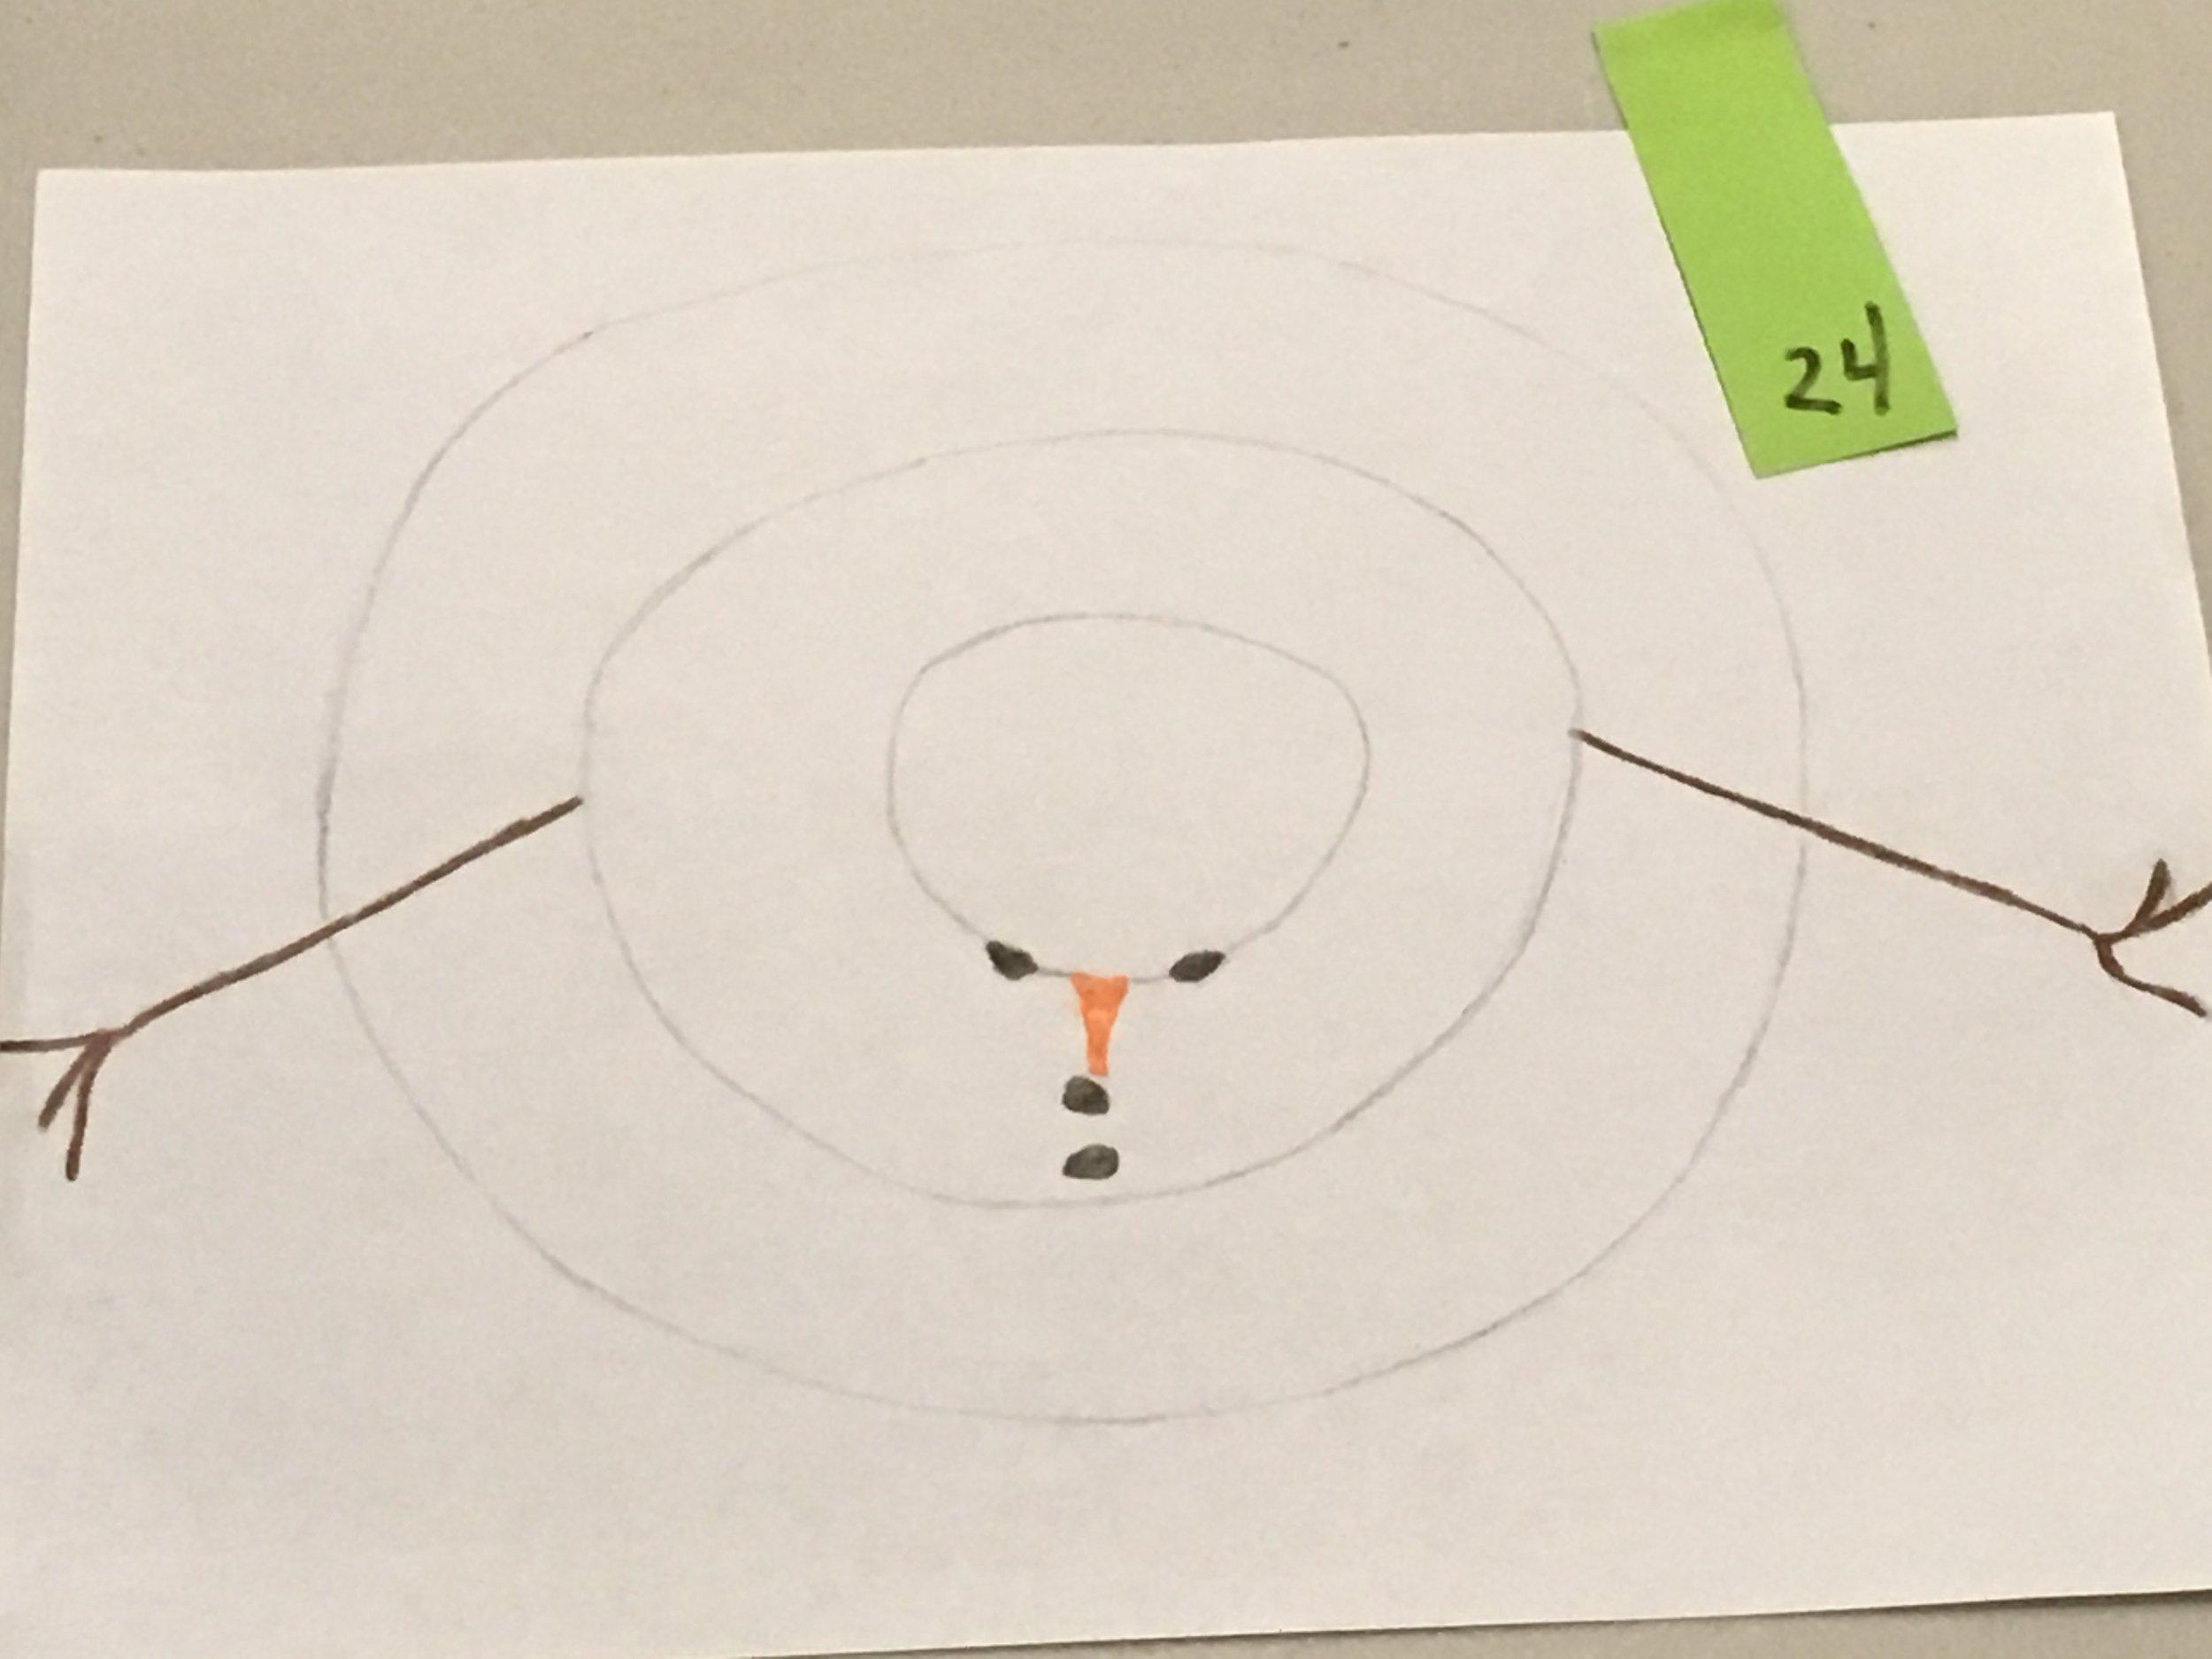 Aerial view of a snowman